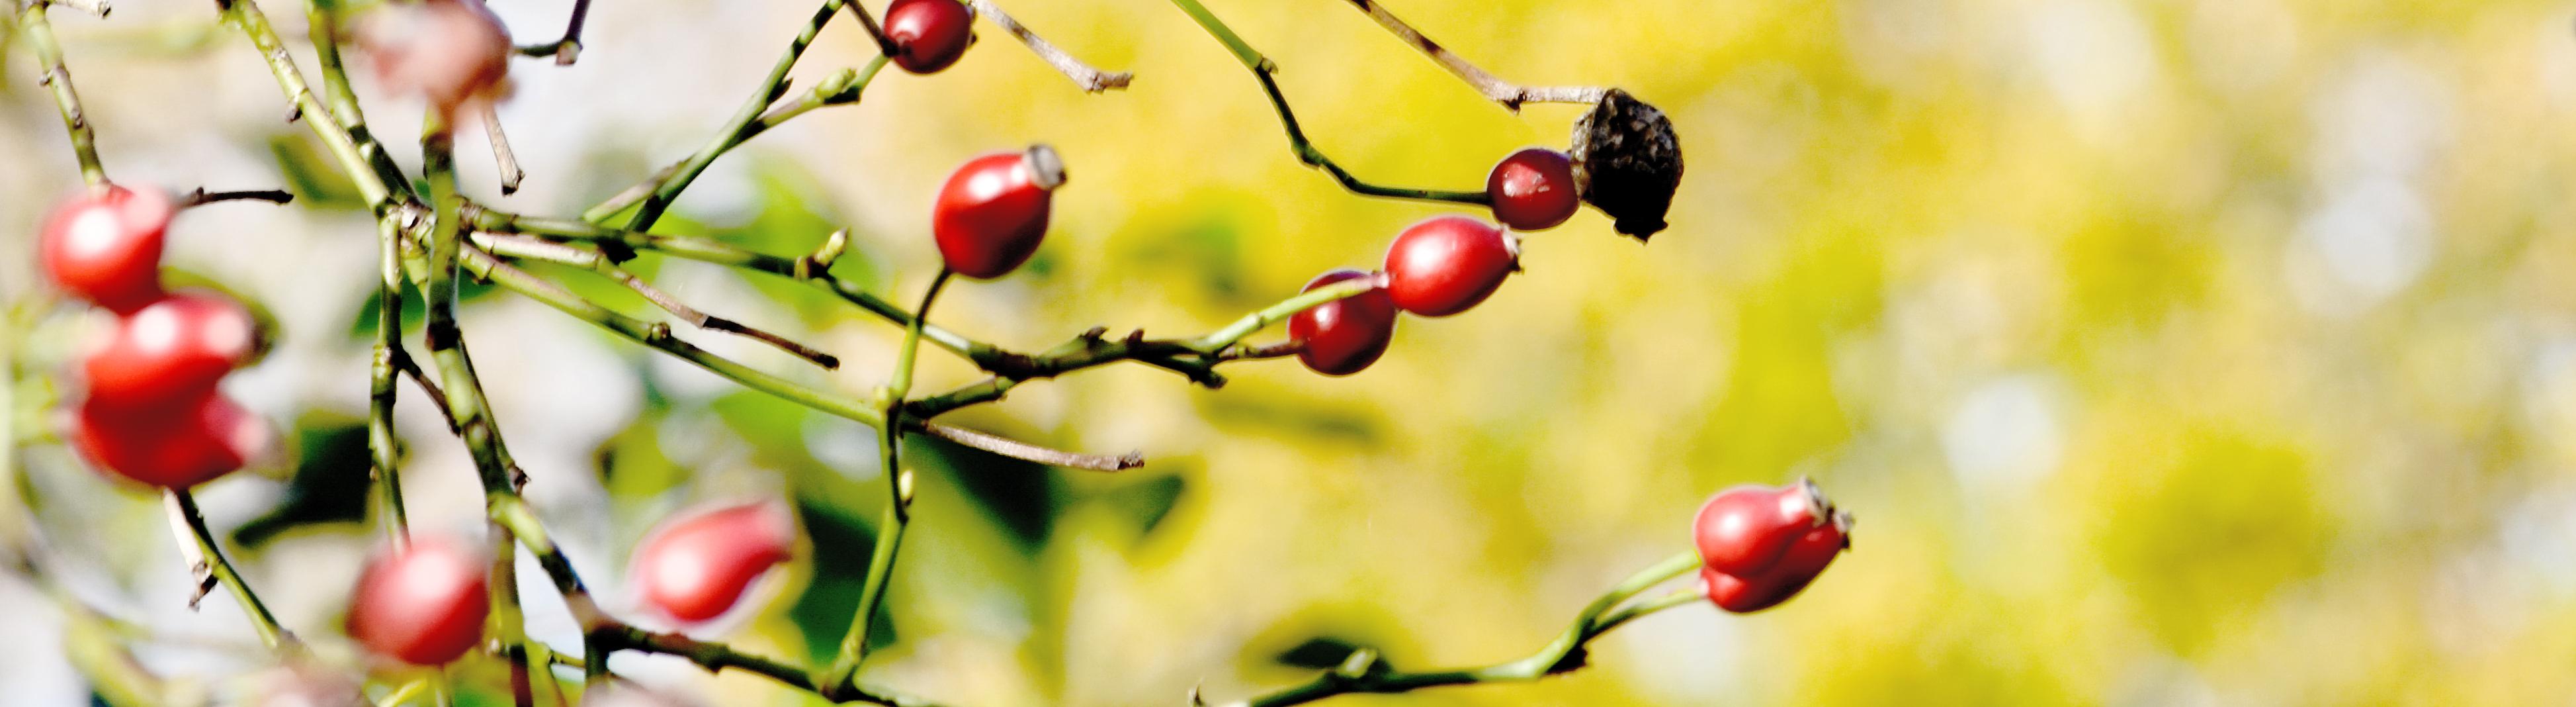 Karin Waldner Fotografie: Detail in red en ocre